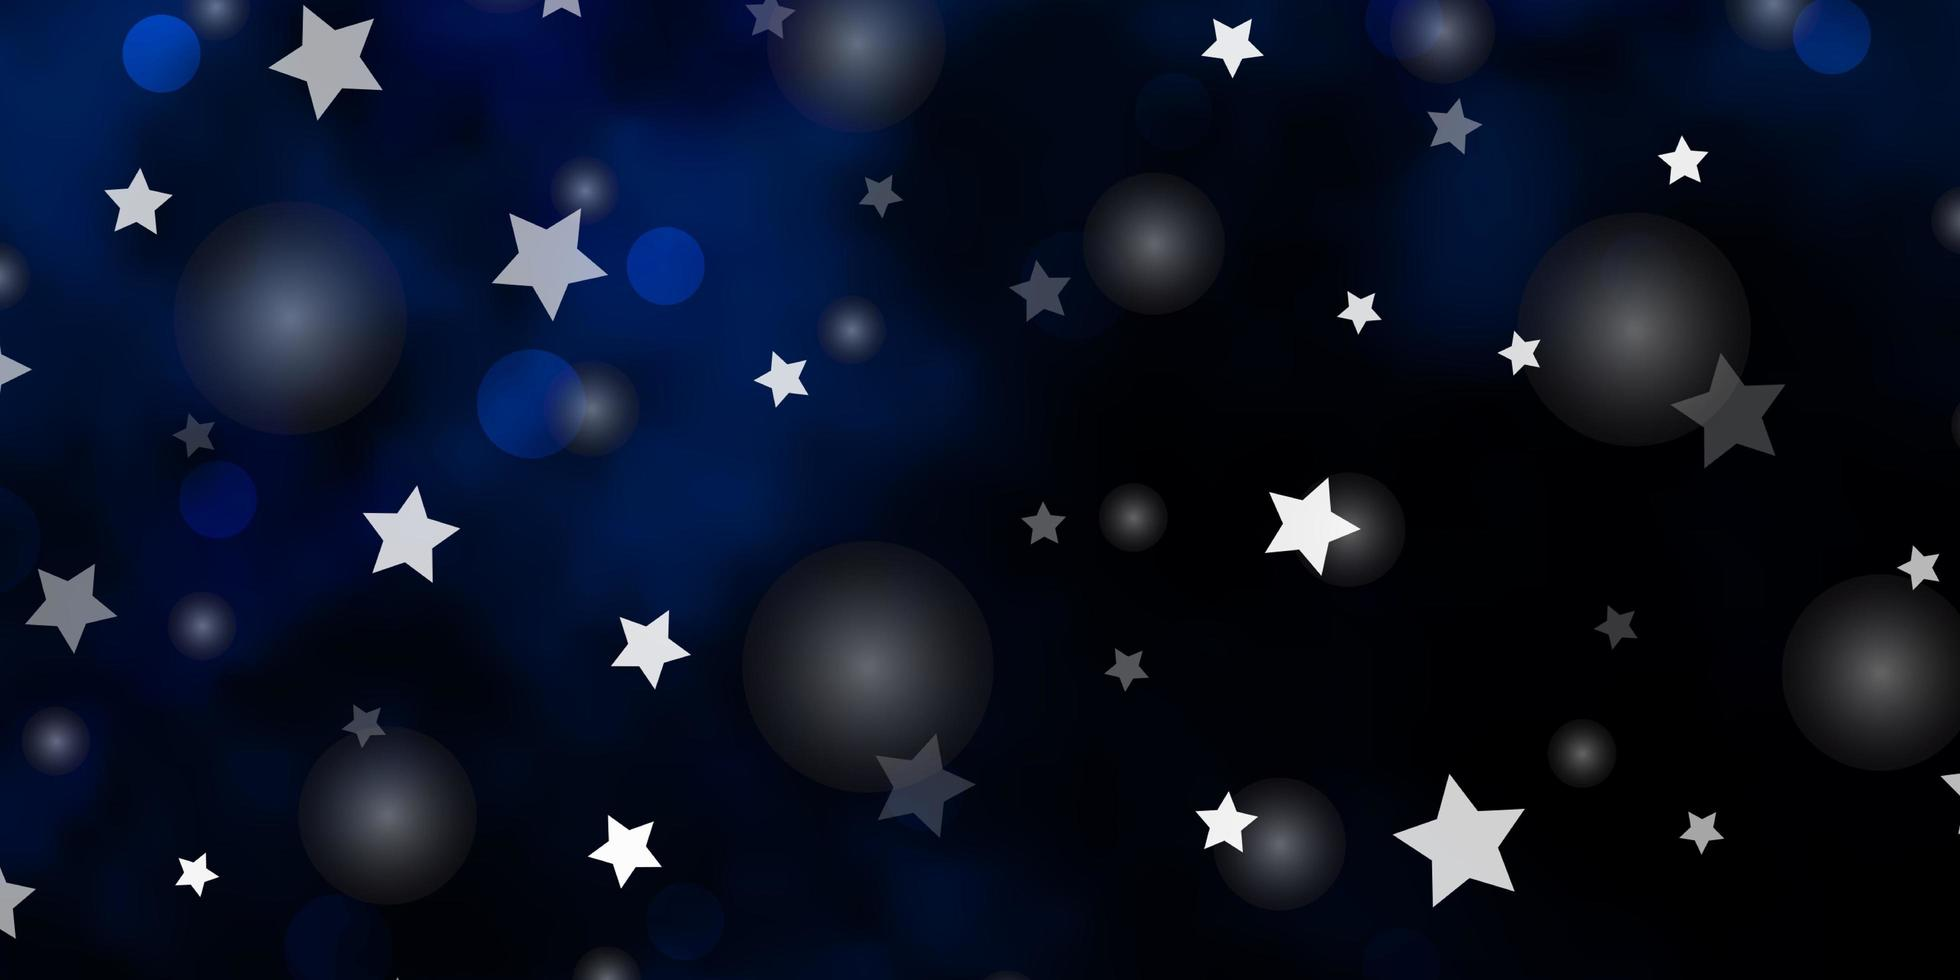 Dark BLUE vector layout with circles, stars.